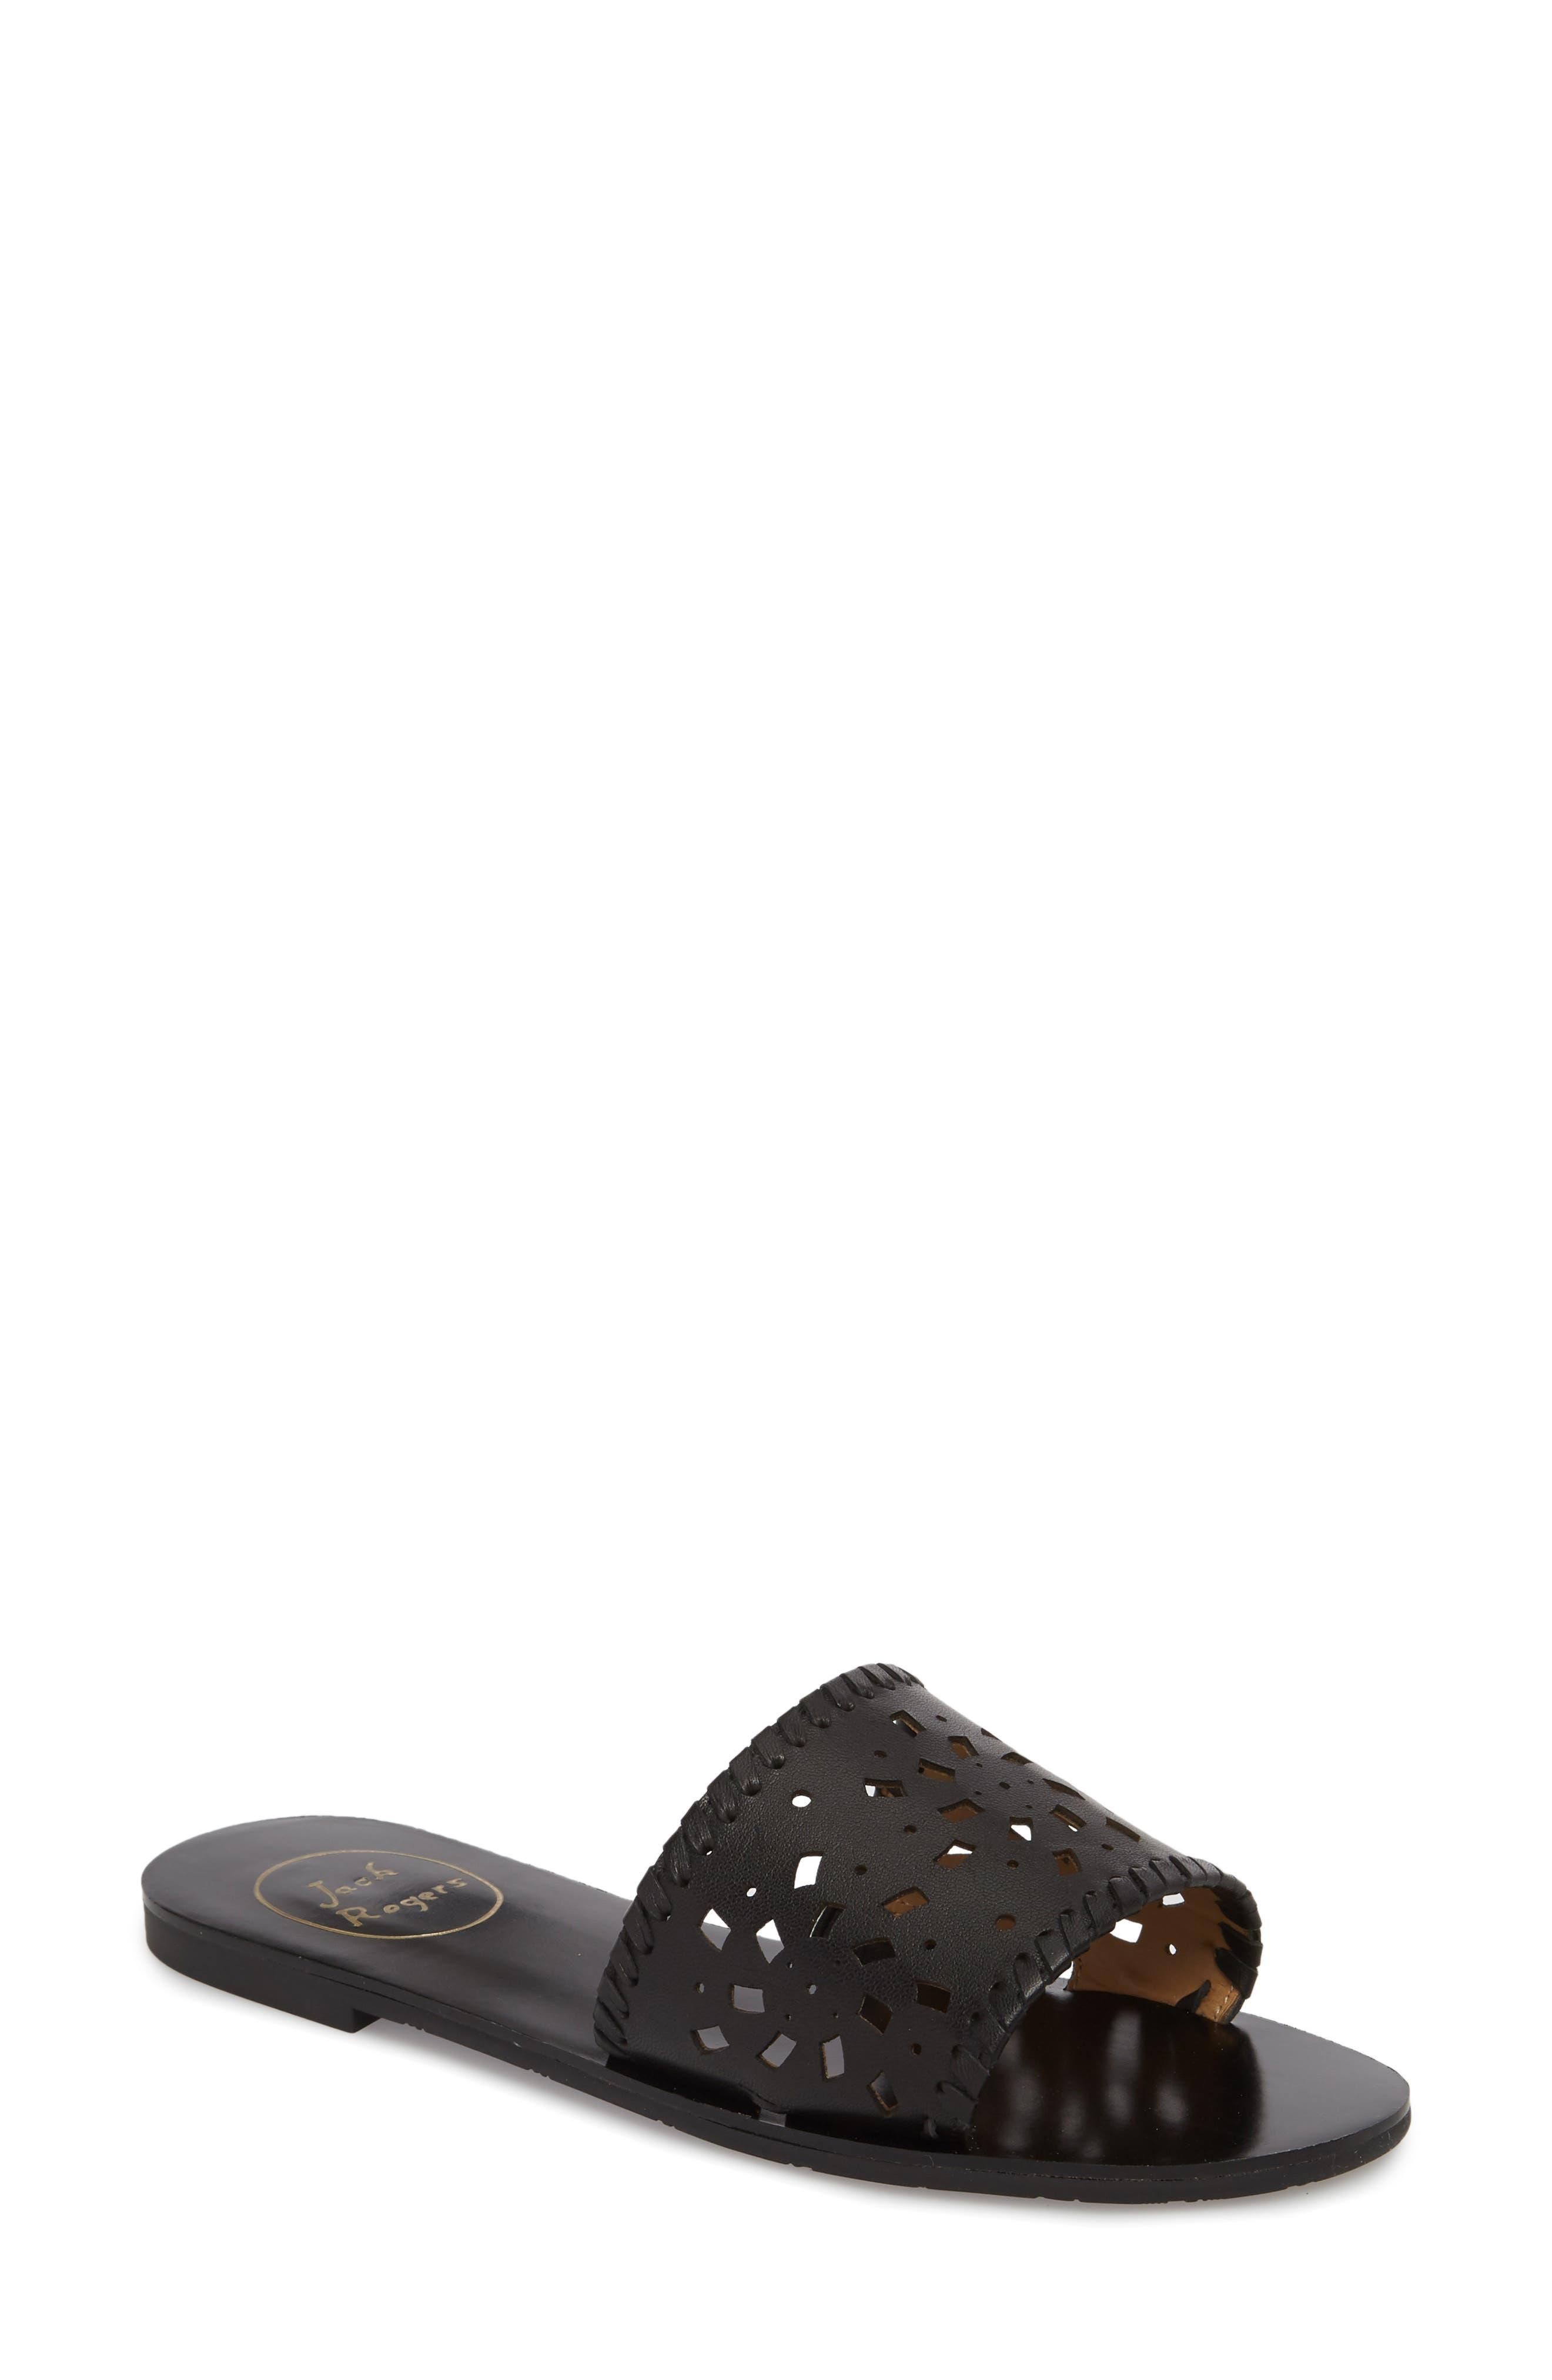 Delilah Slide Sandal,                         Main,                         color, 001